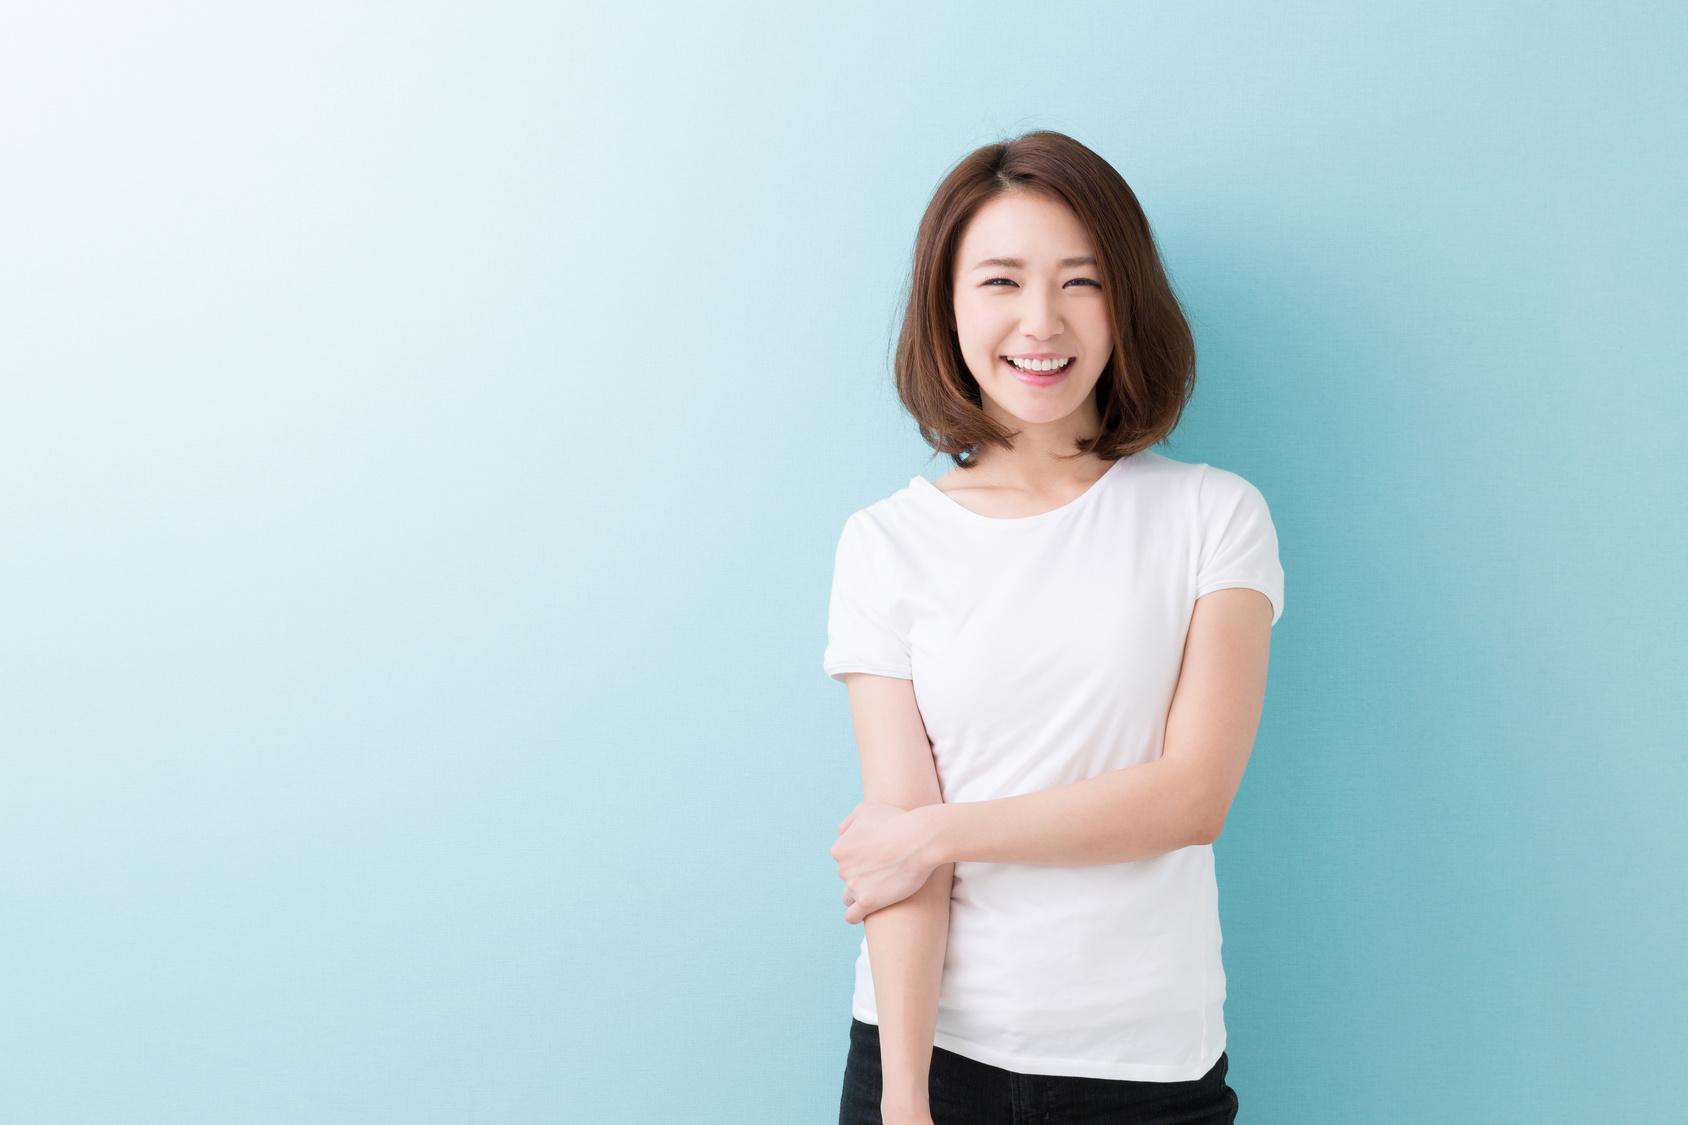 gratis dating sites Seoul